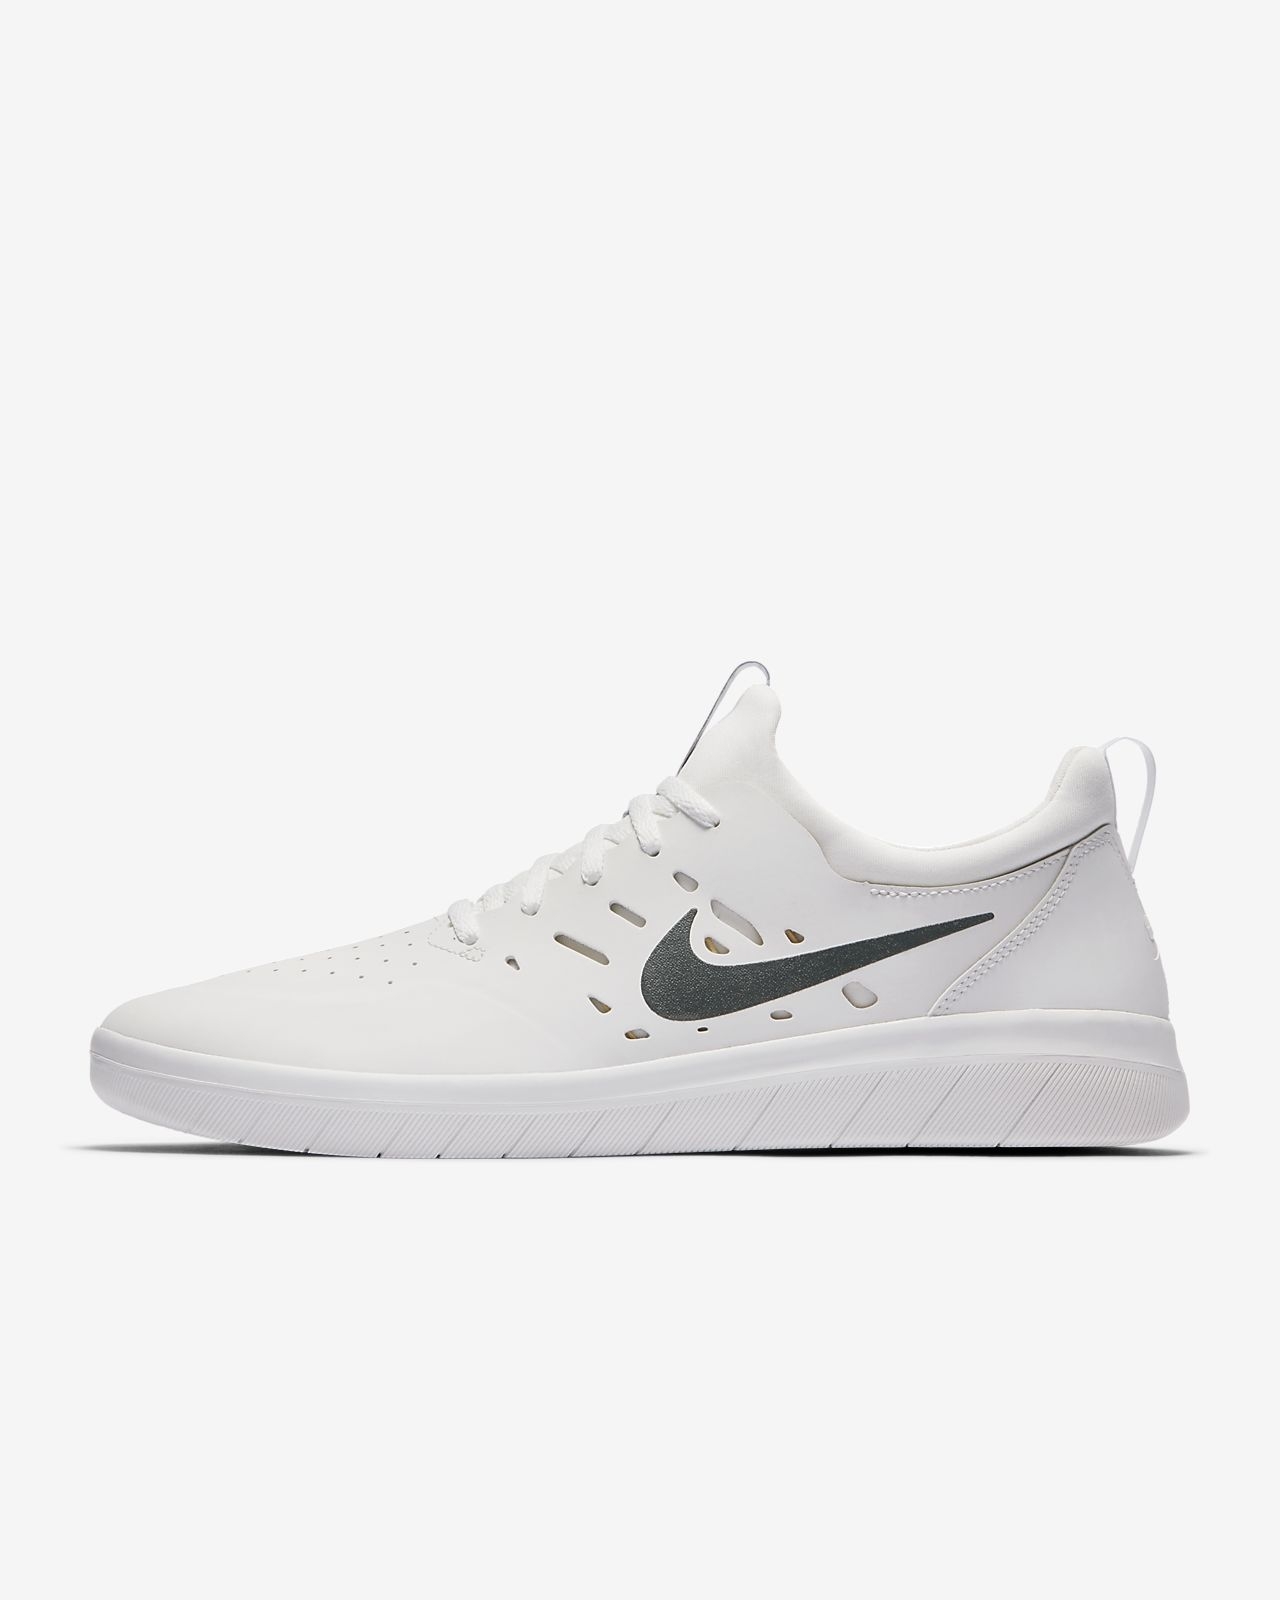 Nike sb   Shape Store consegna e reso gratis.